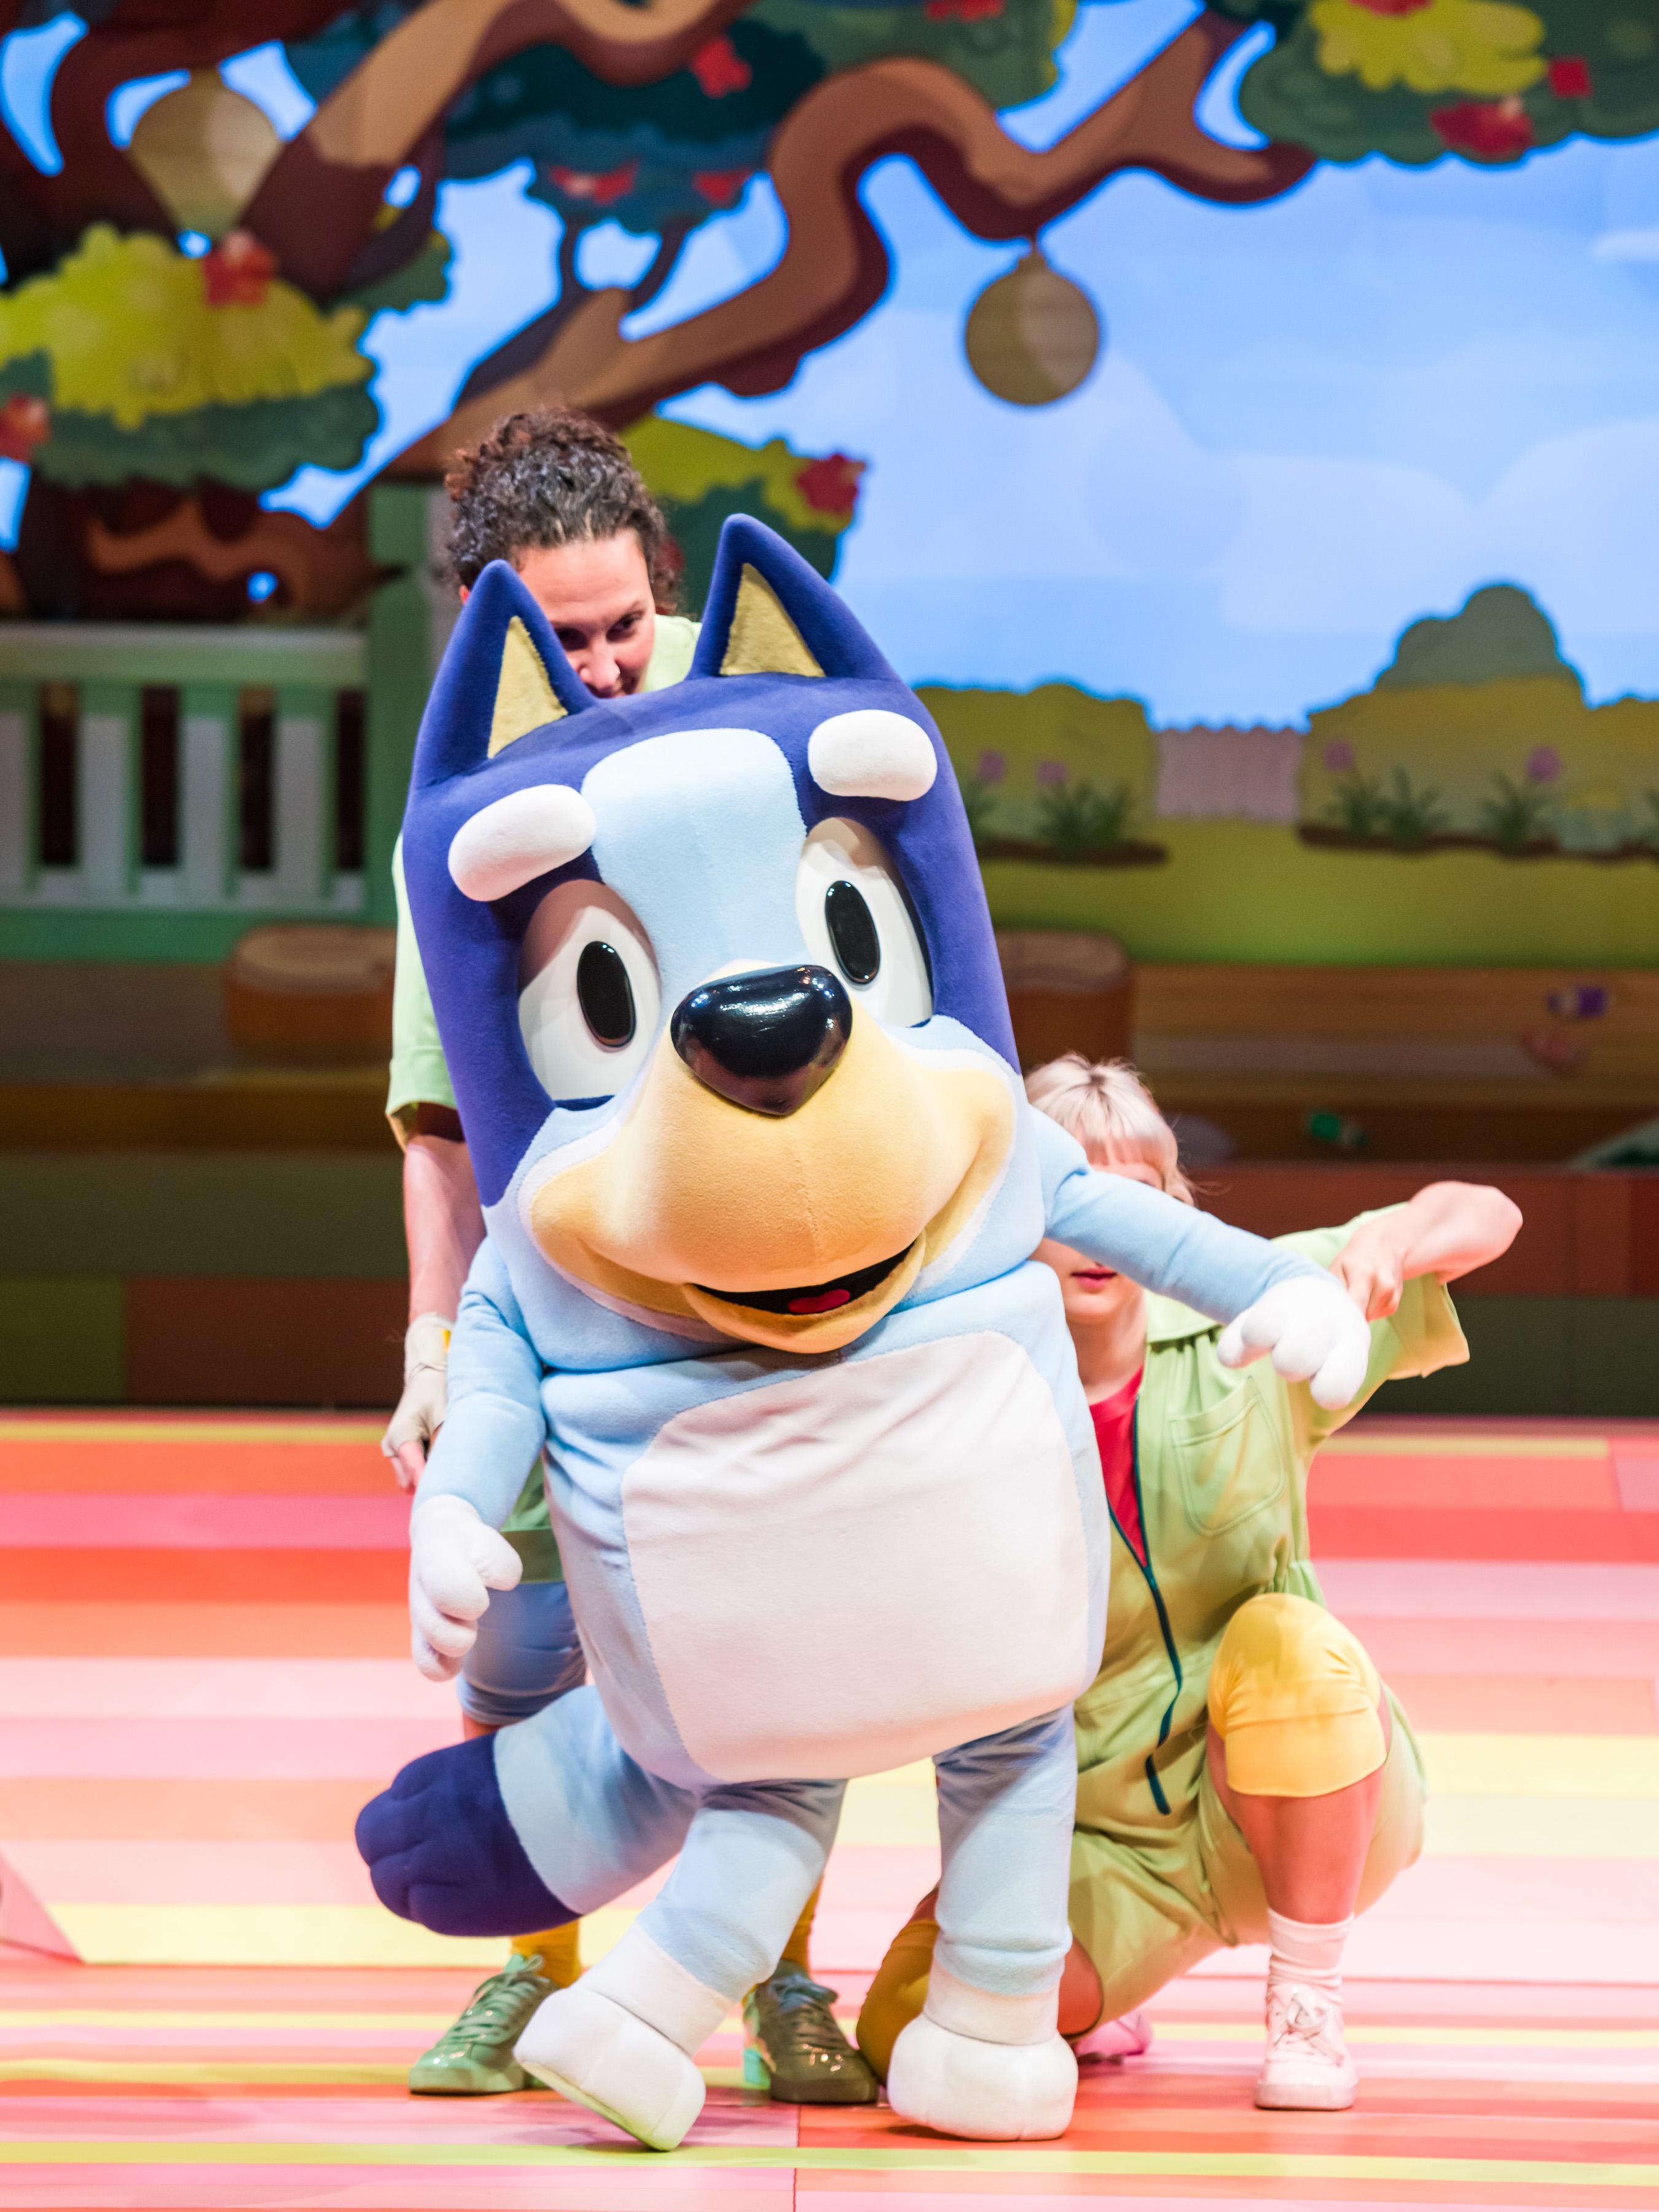 Image of Blueys Big Play production